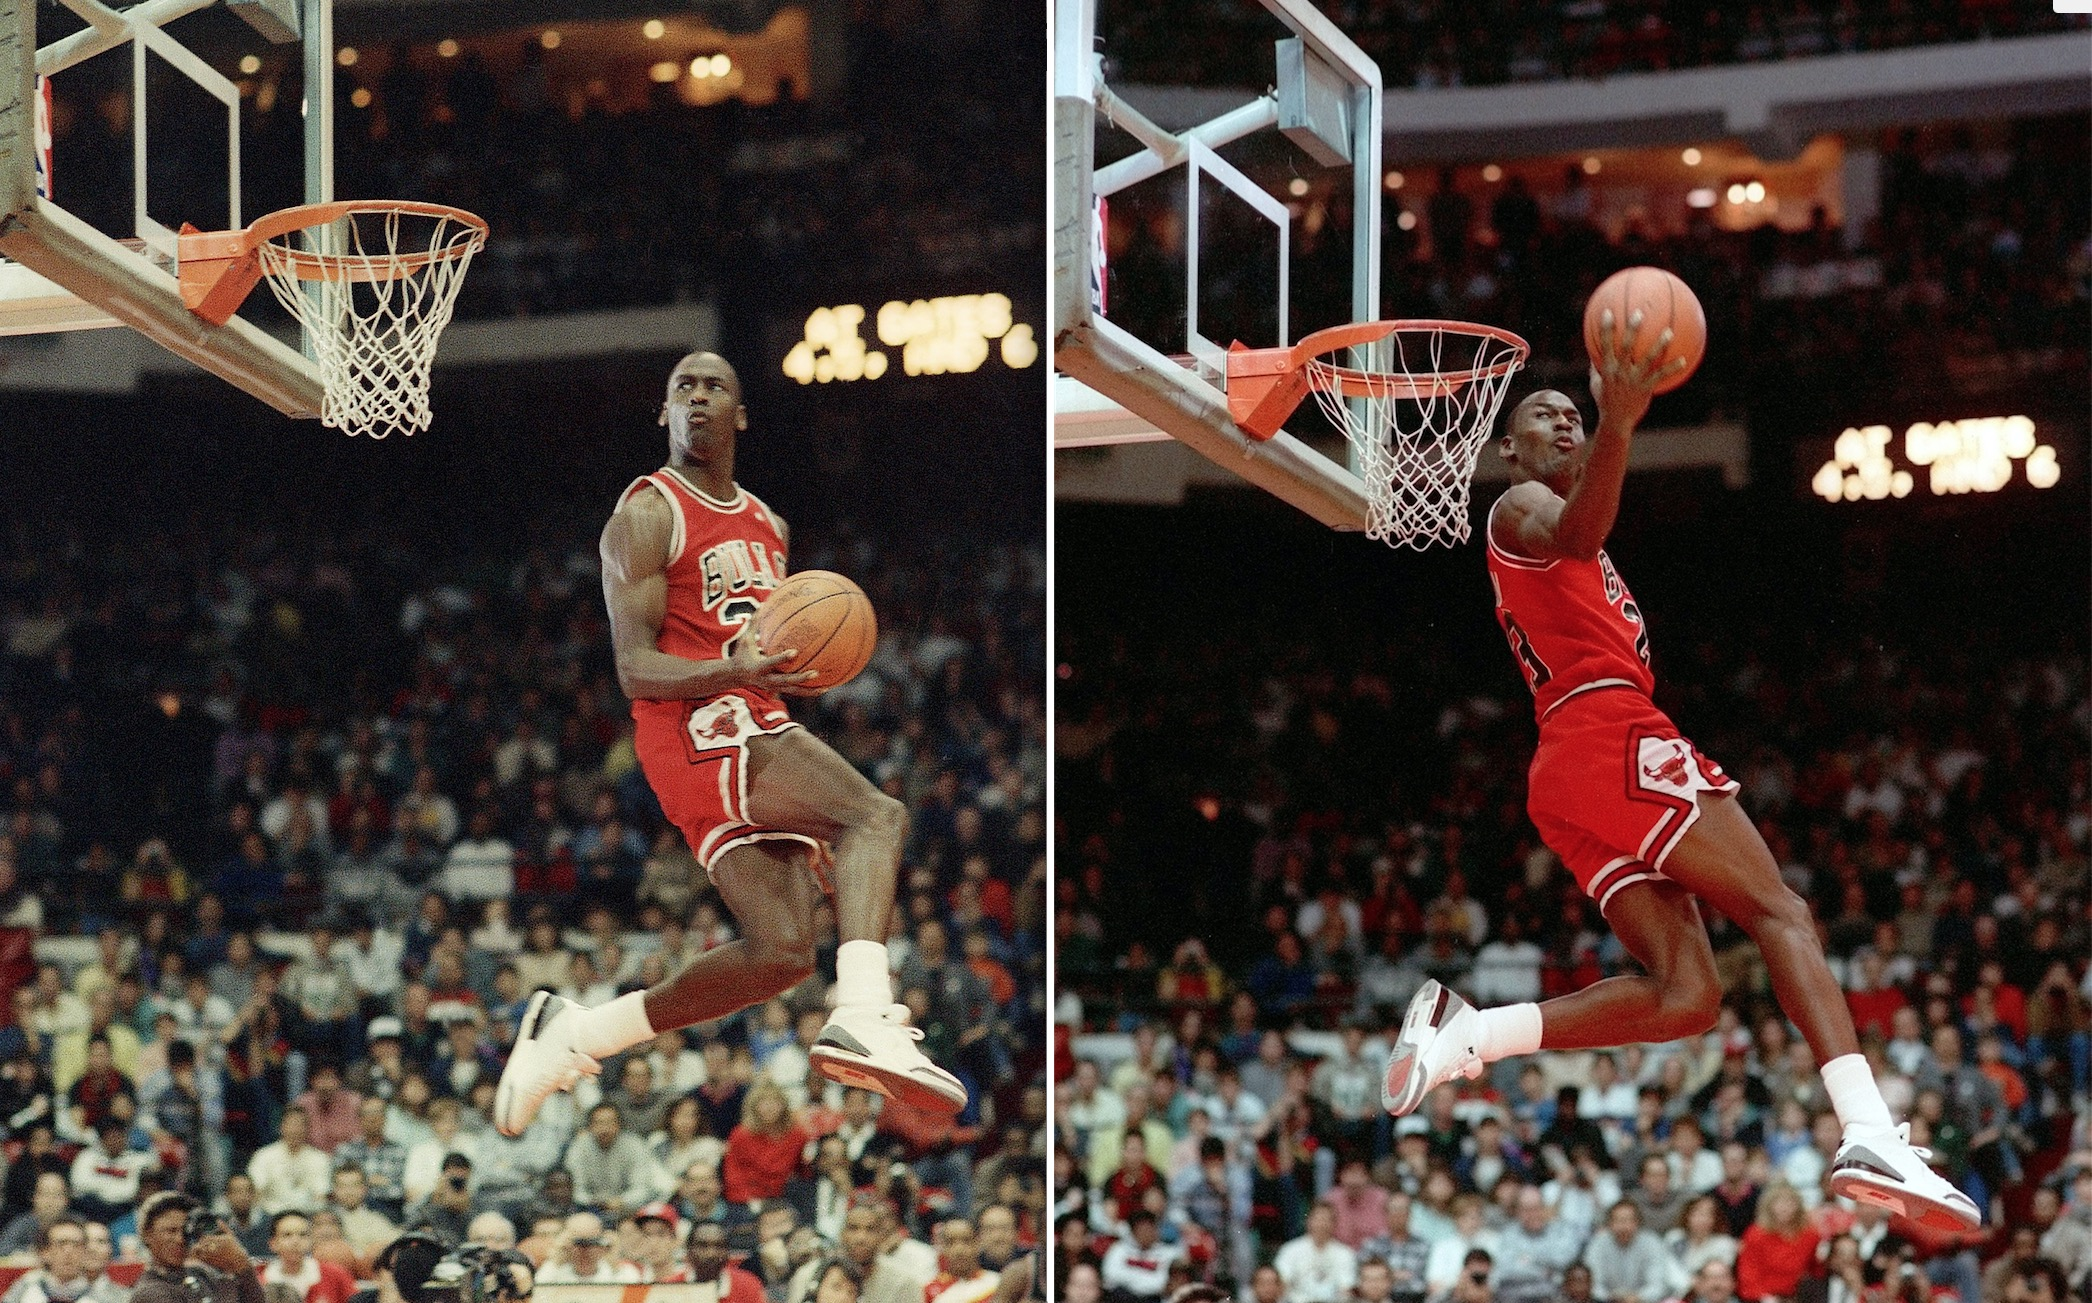 NBA Fan Gets Tattoo Of Michael Jordans Famous 1988 Free Throw Line Dunk